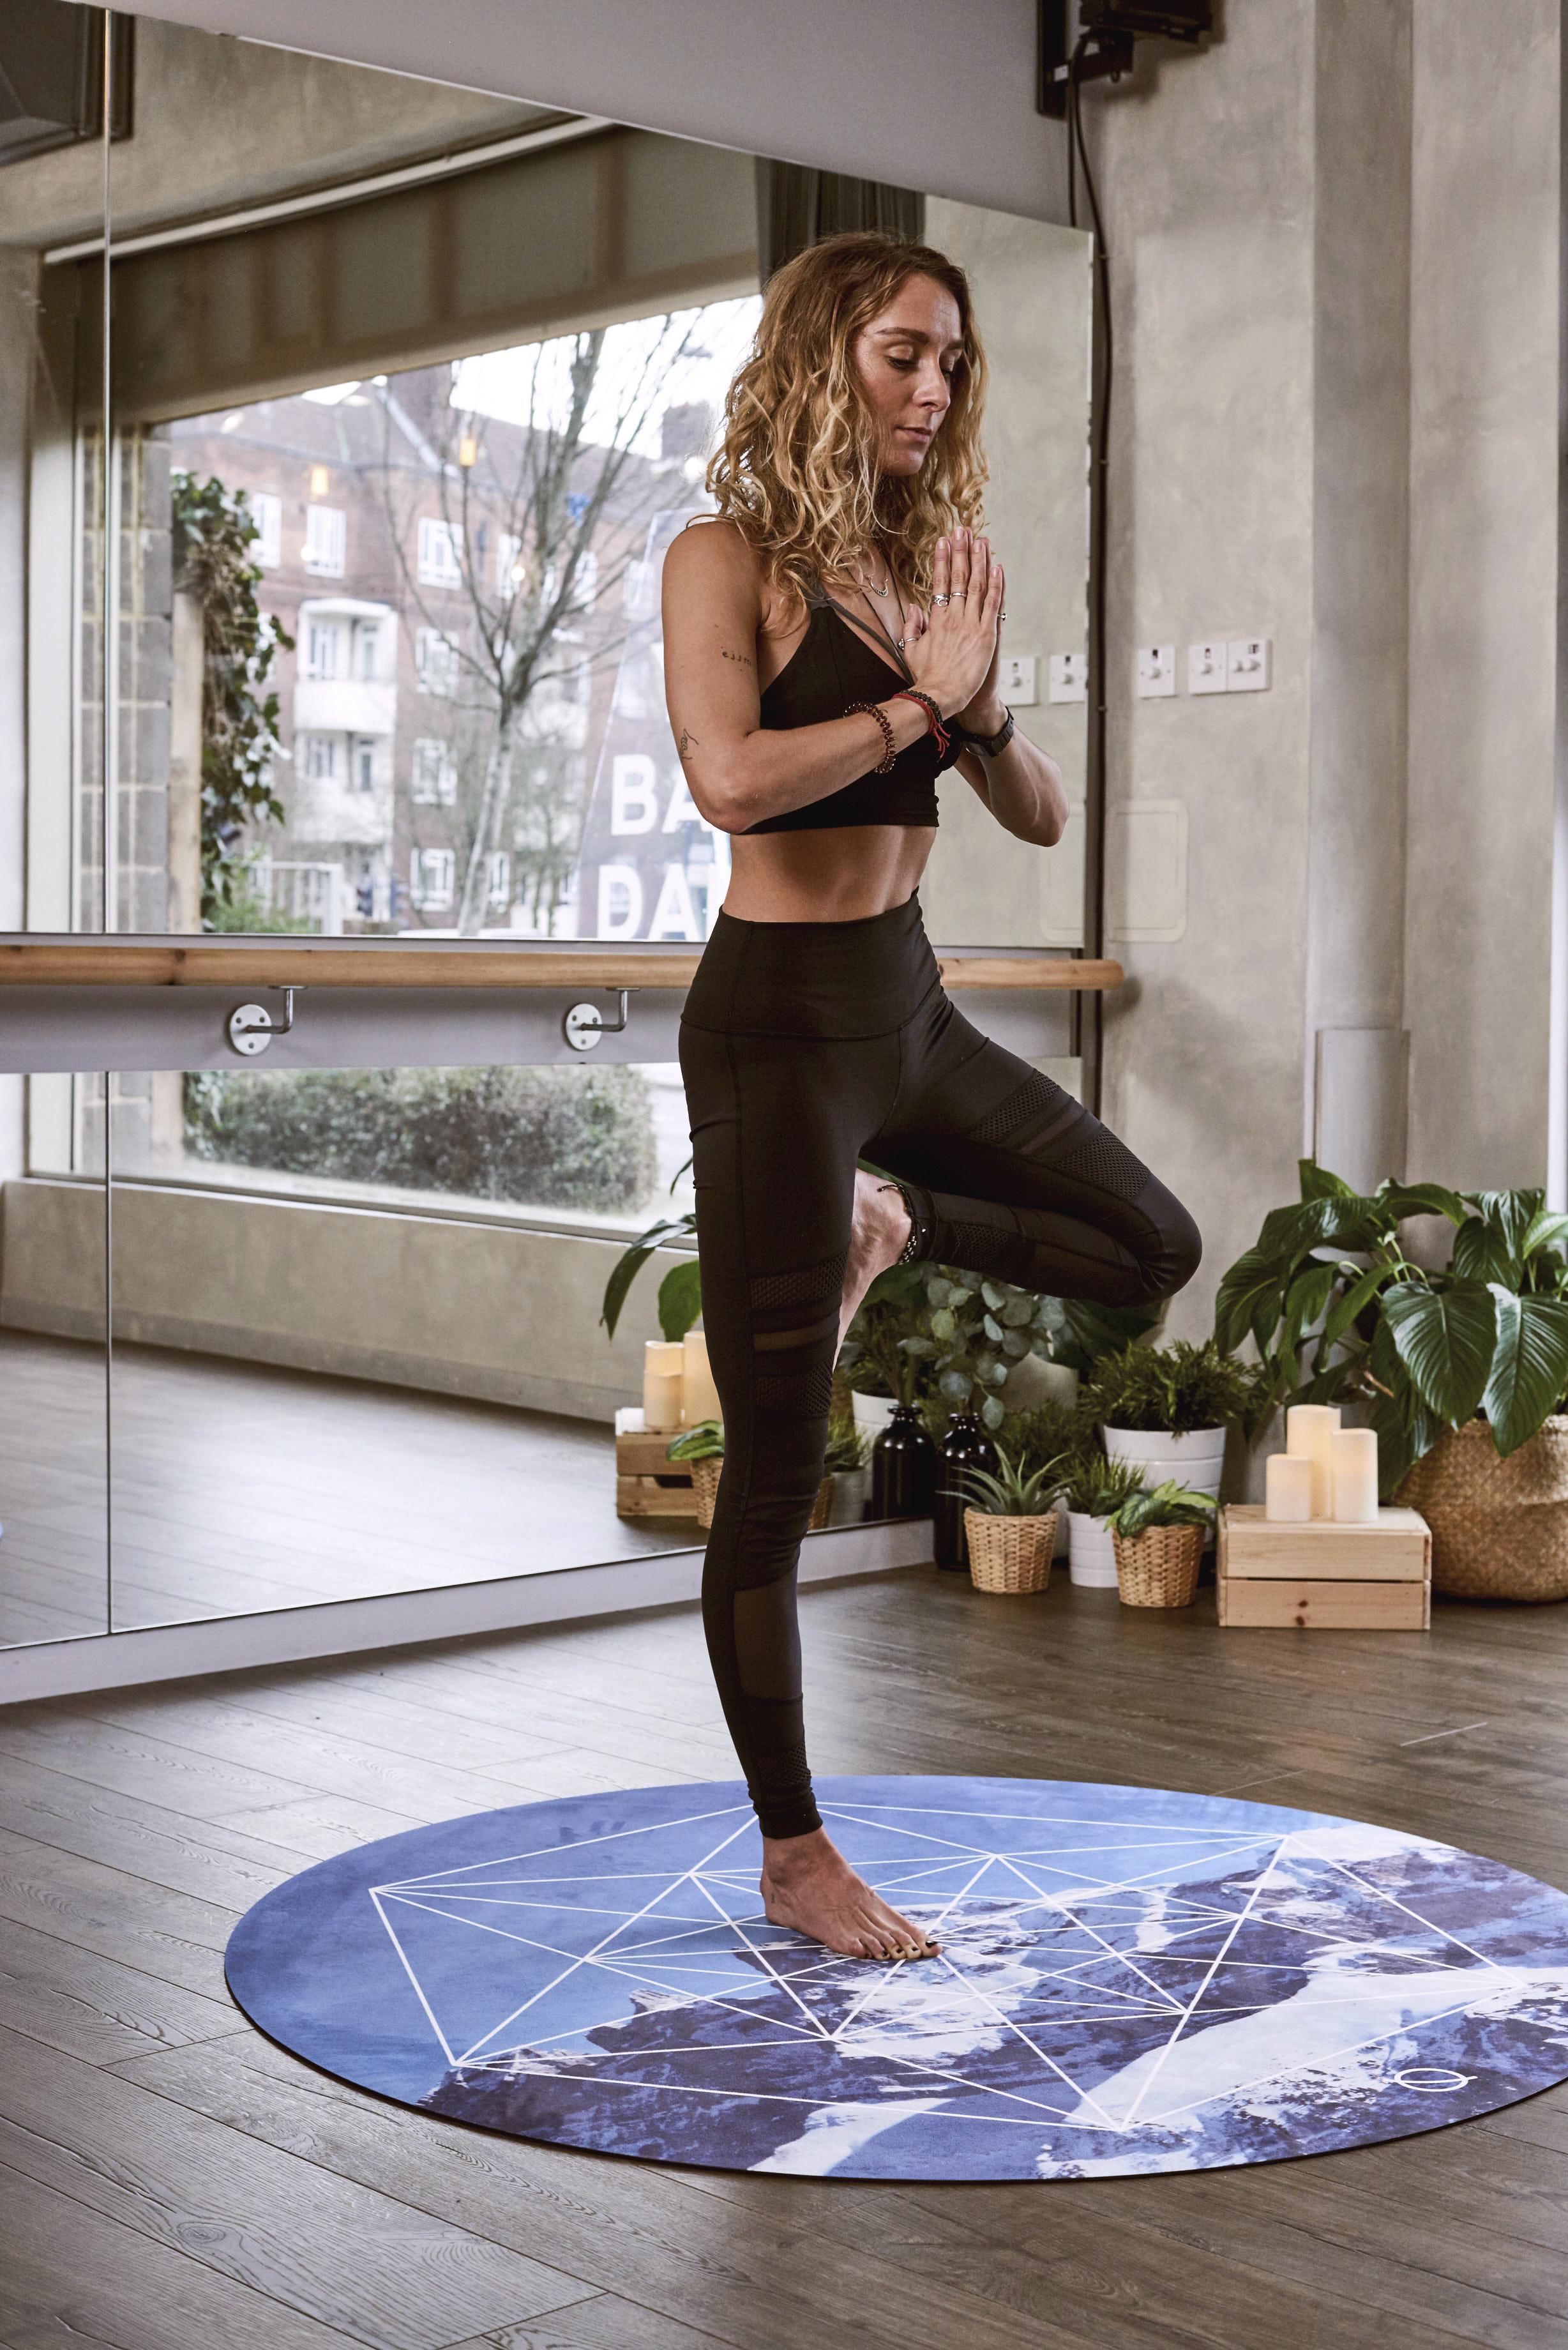 Woman Balancing With Right Foot